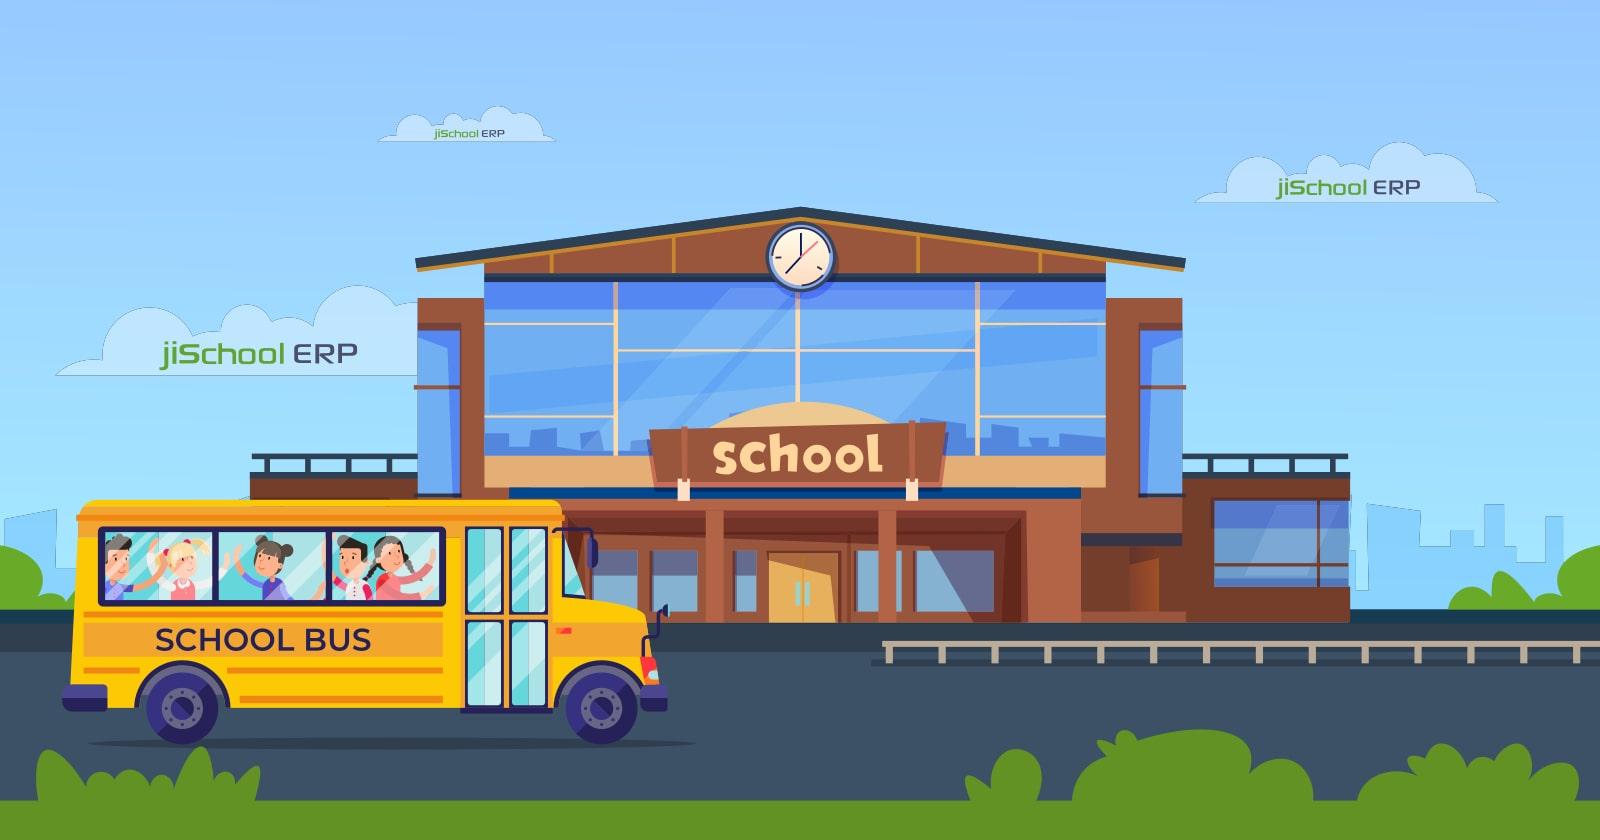 Benefits Of Transport Management System For School